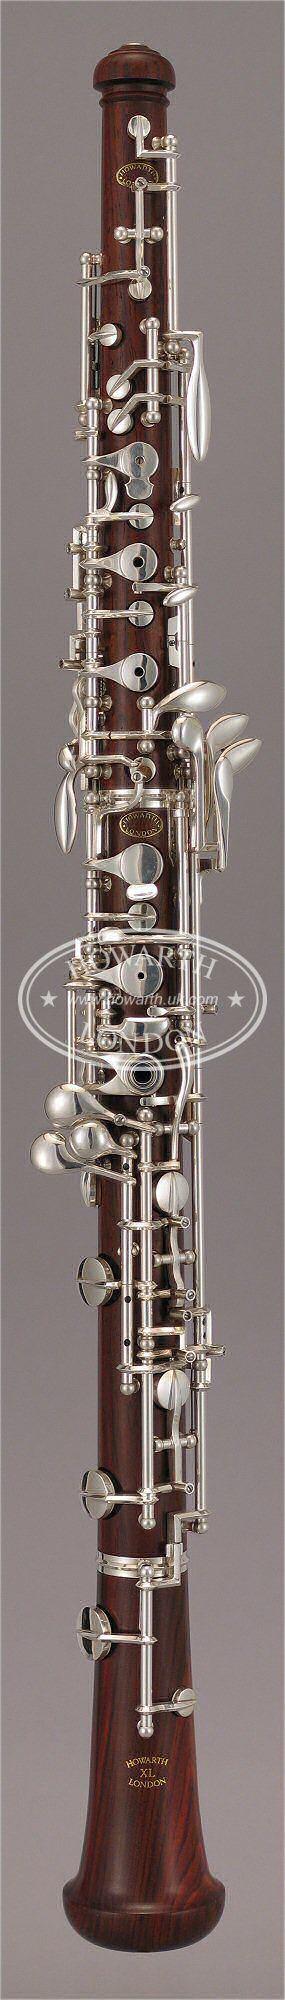 oboe dissertation search